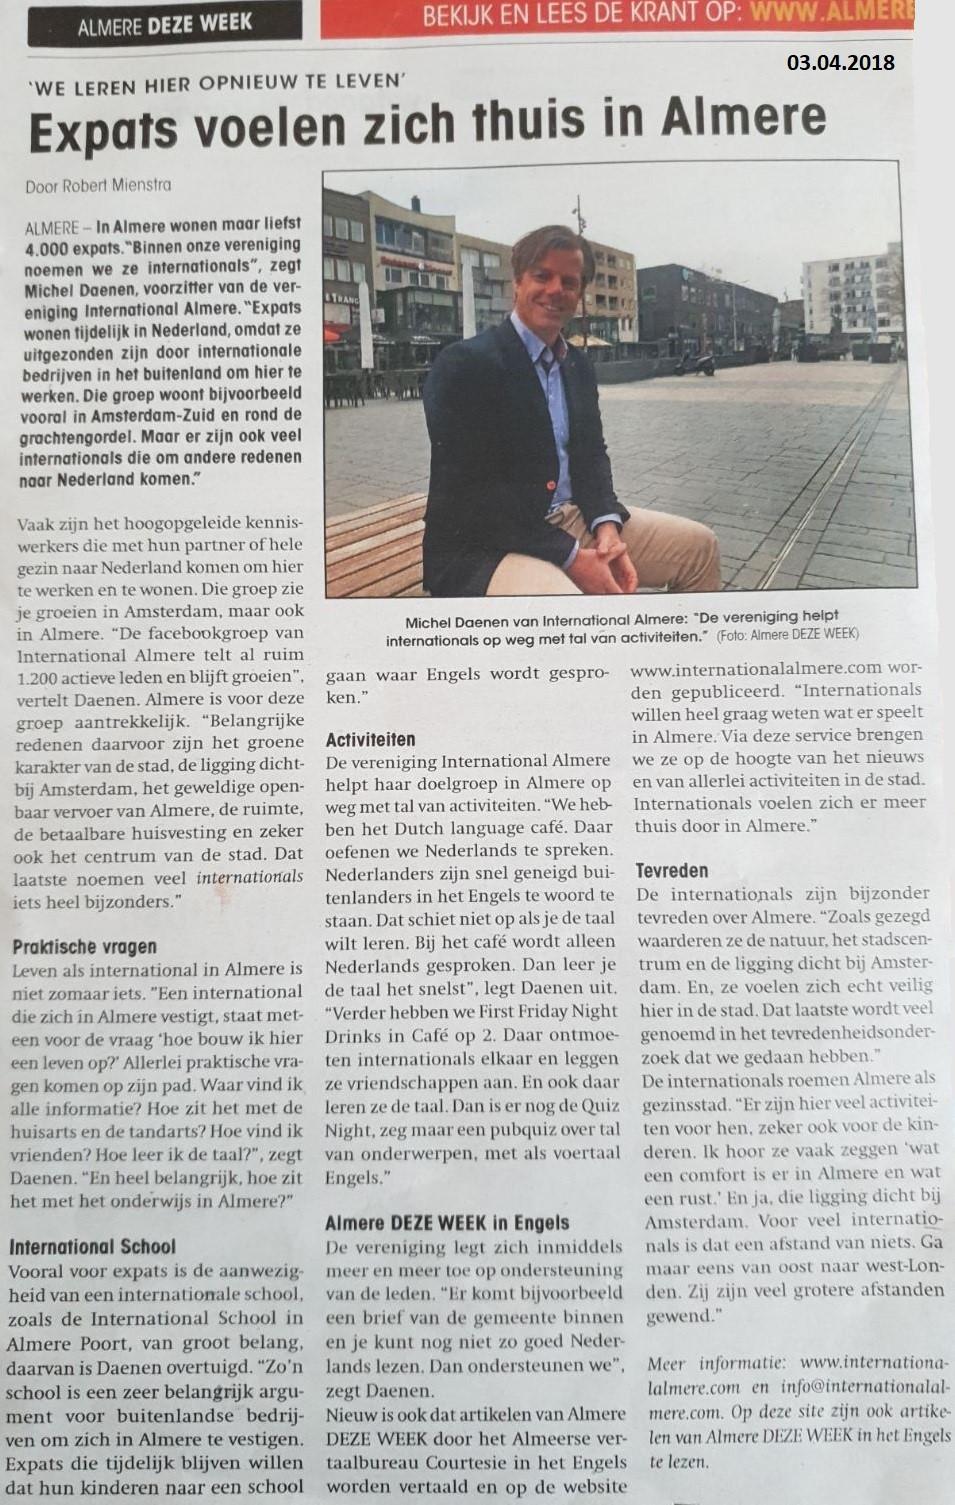 Expats voelen zich thuis in Almere